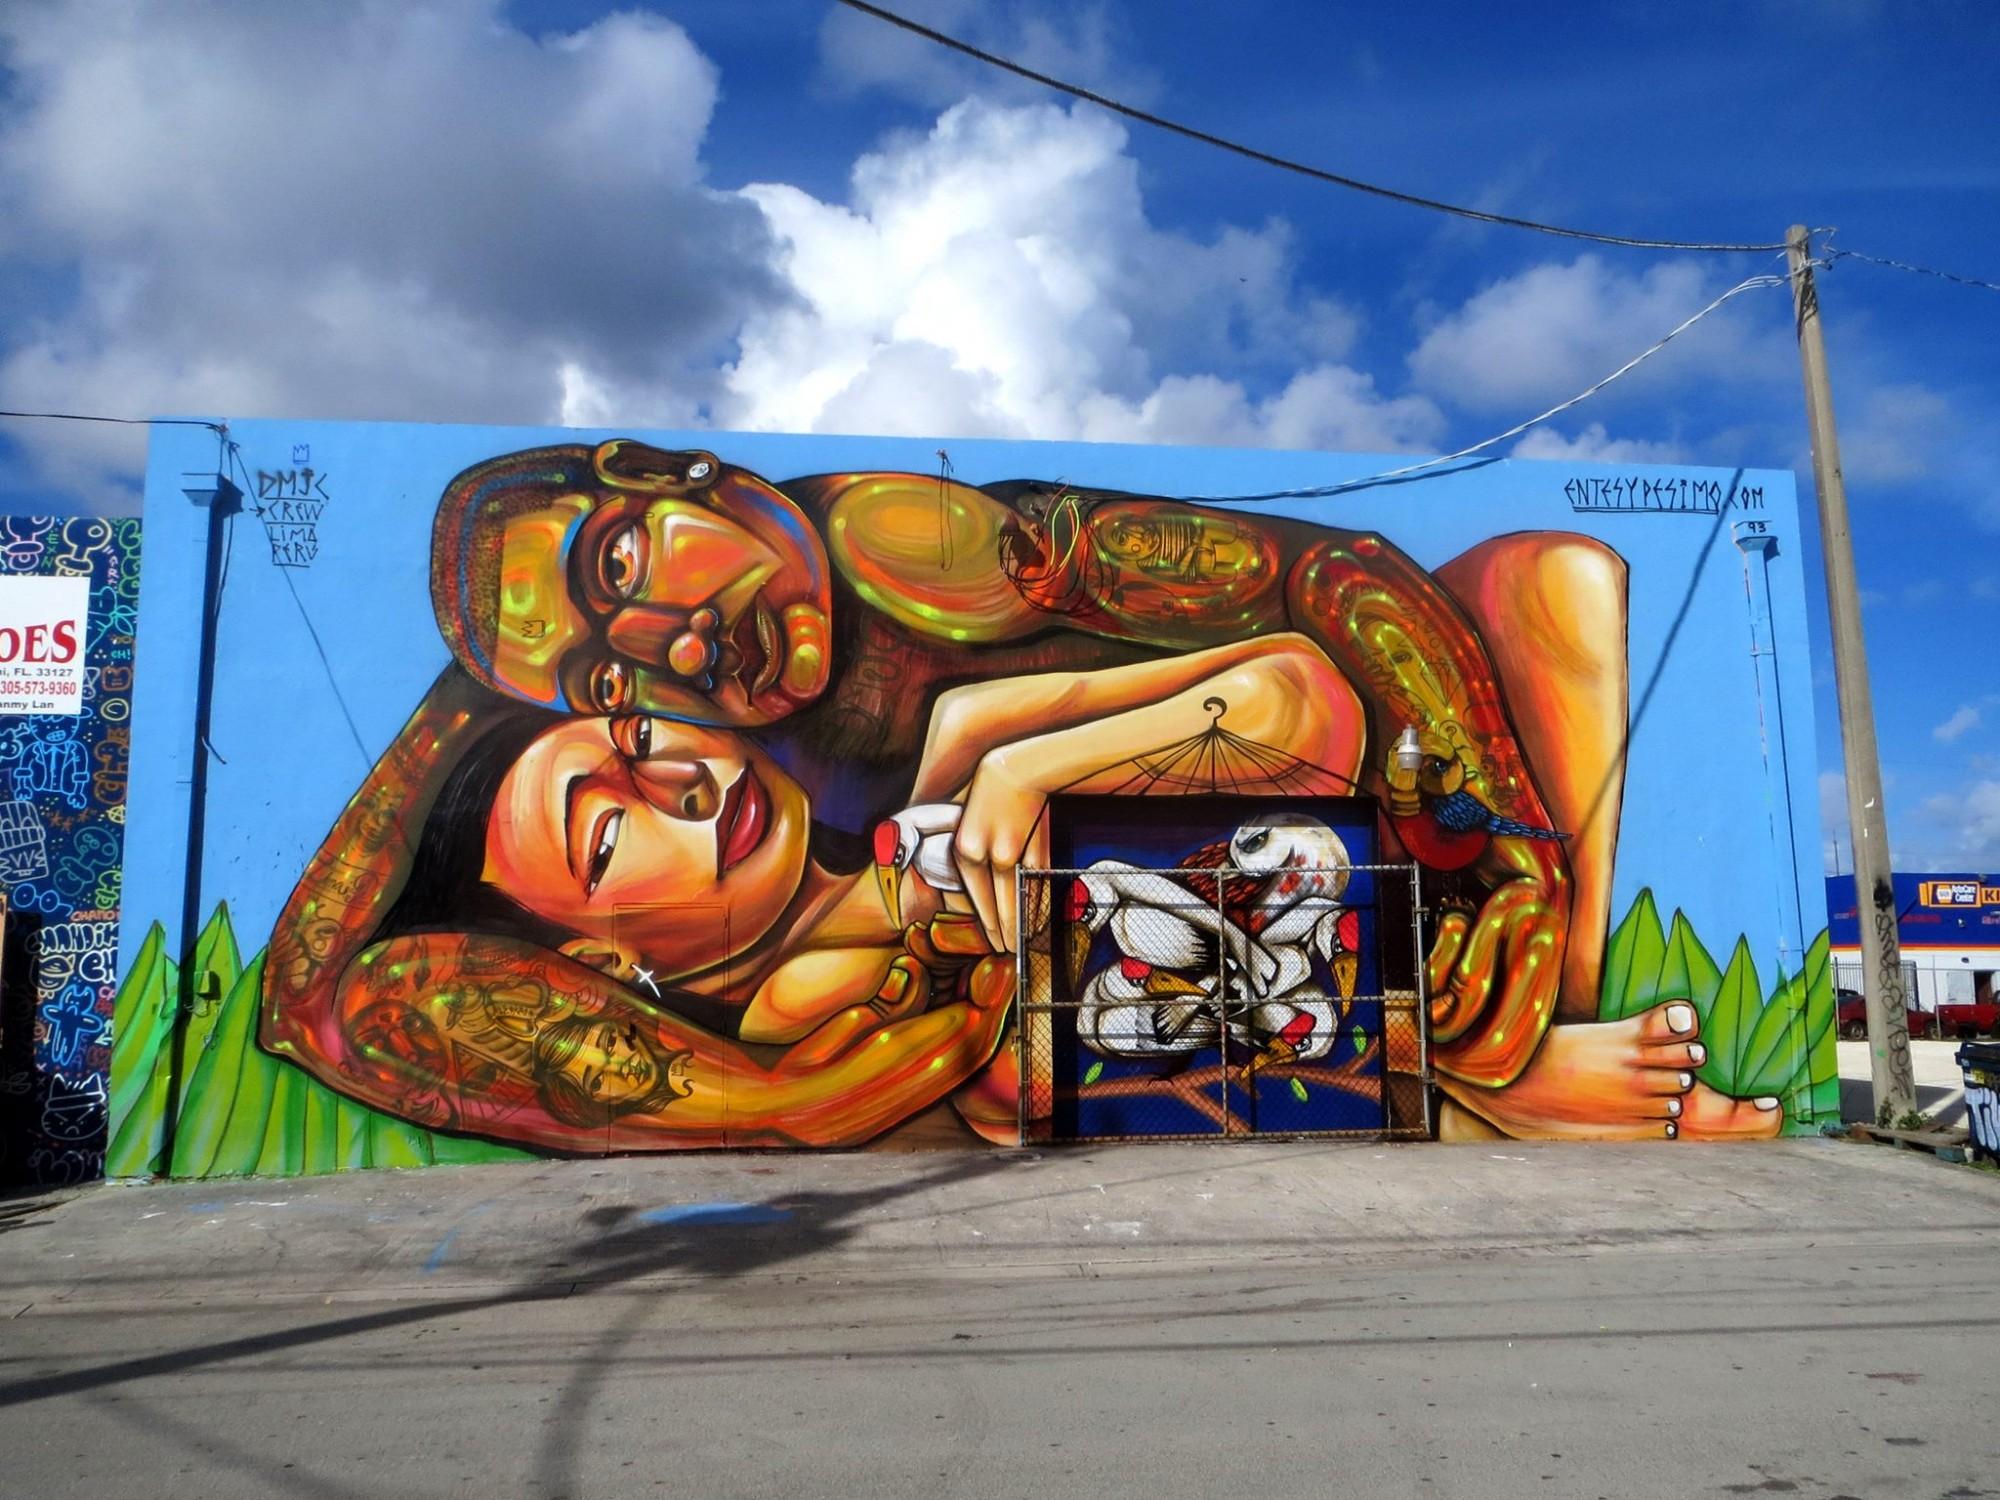 Mural de Entes y Pésimo en Miami.